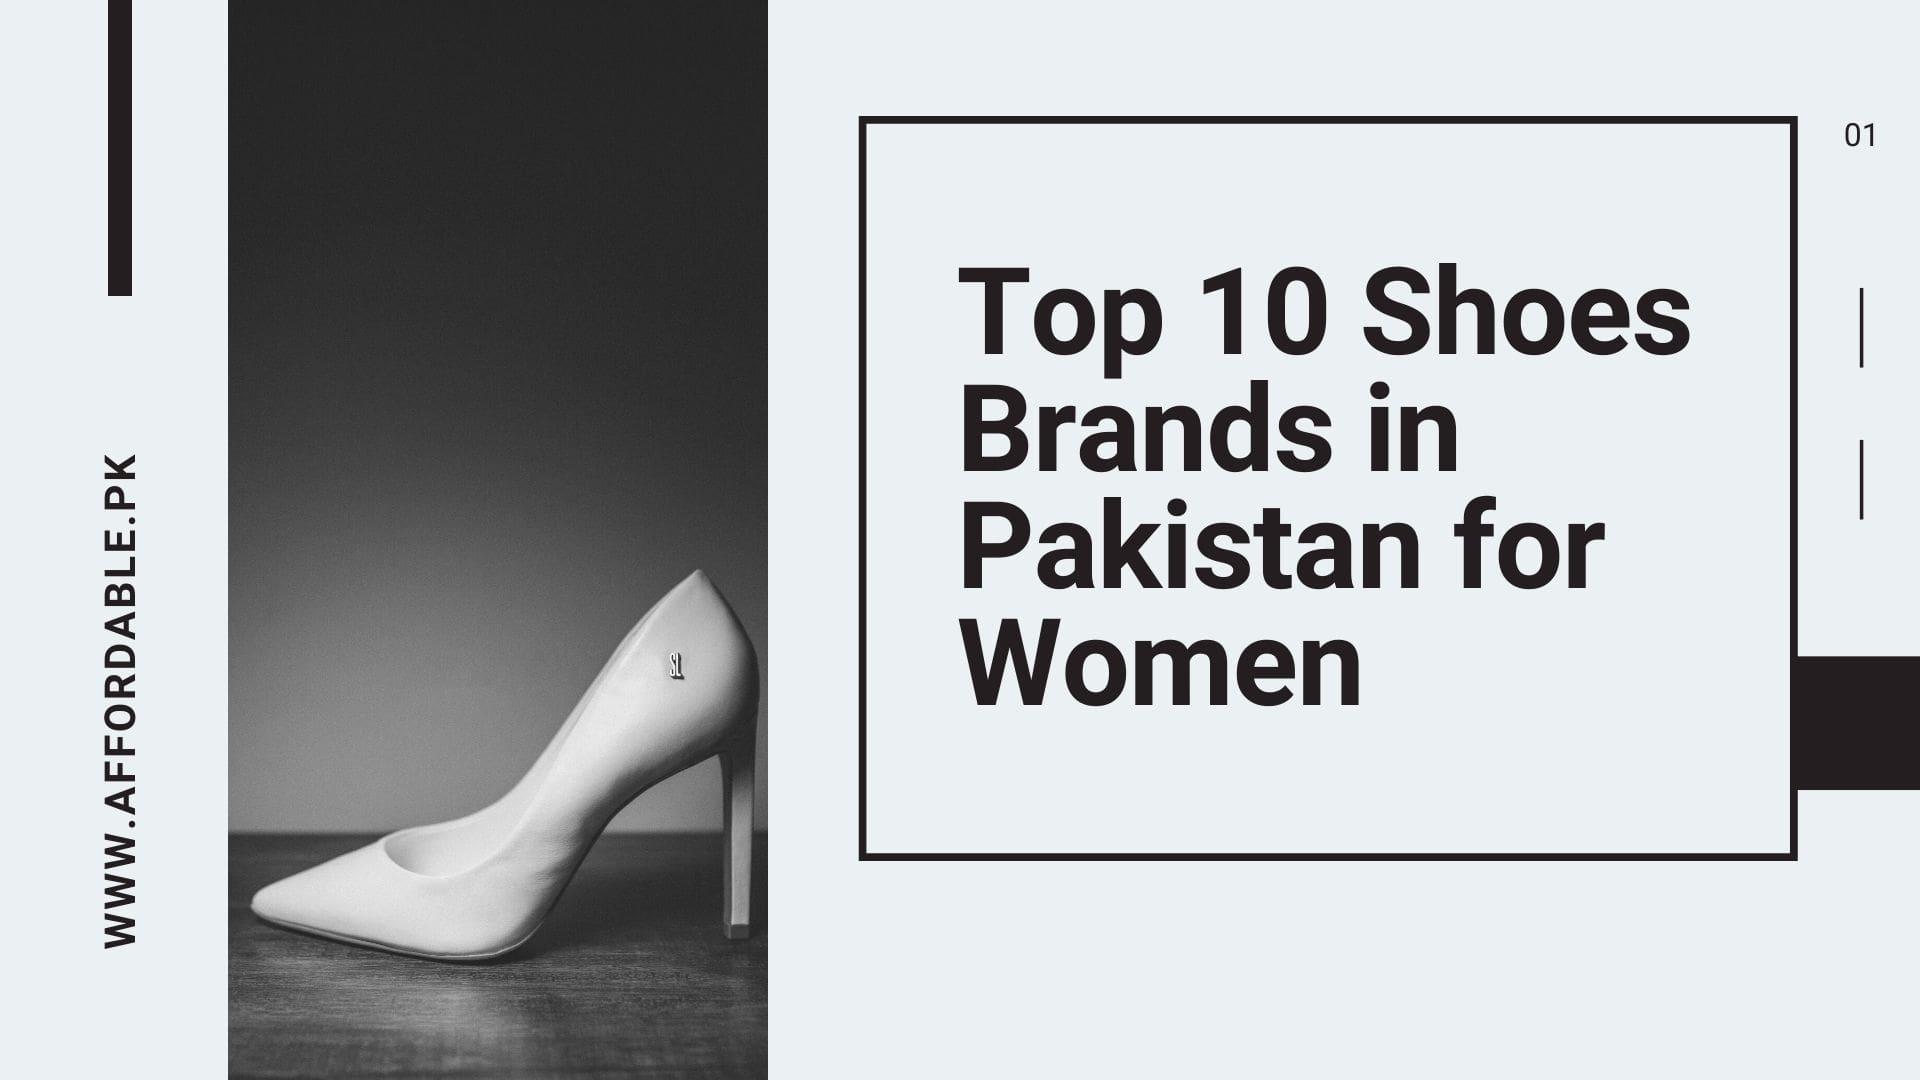 Top 10 Shoes Brands in Pakistan for Women